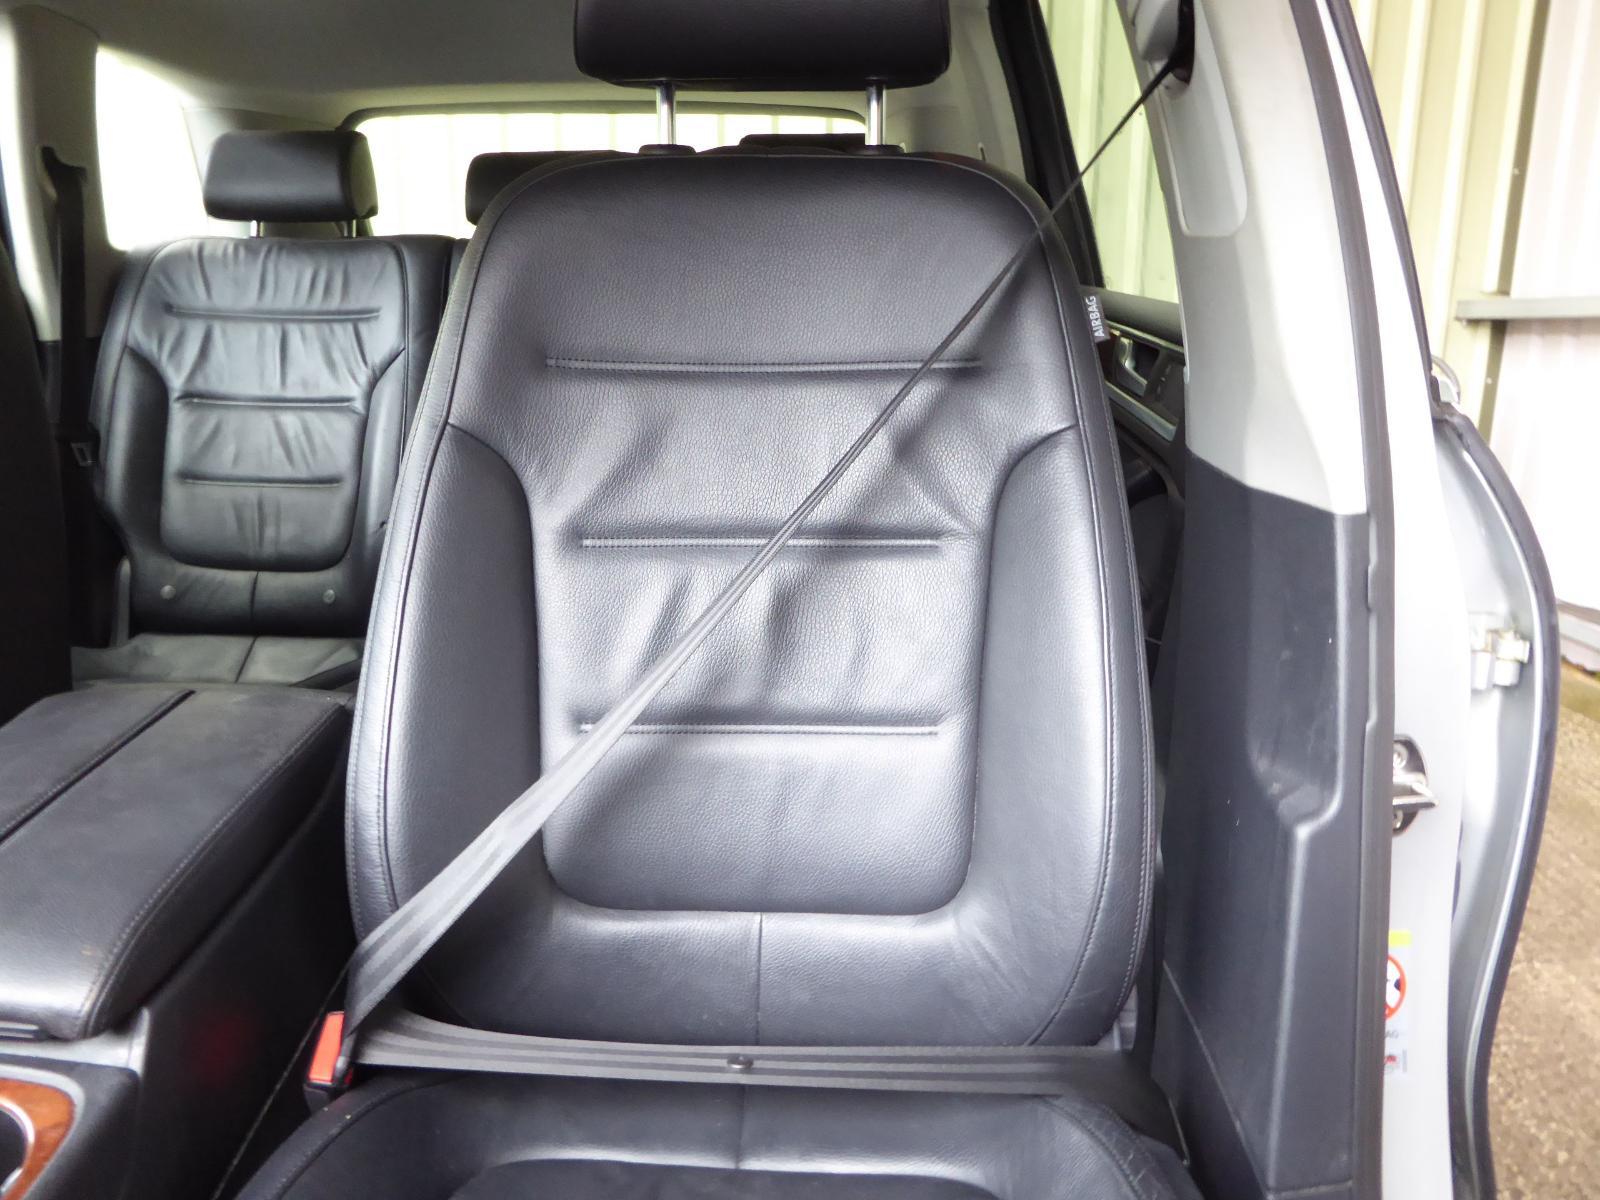 View Auto part Seat Belt VOLKSWAGEN TOUAREG 2012